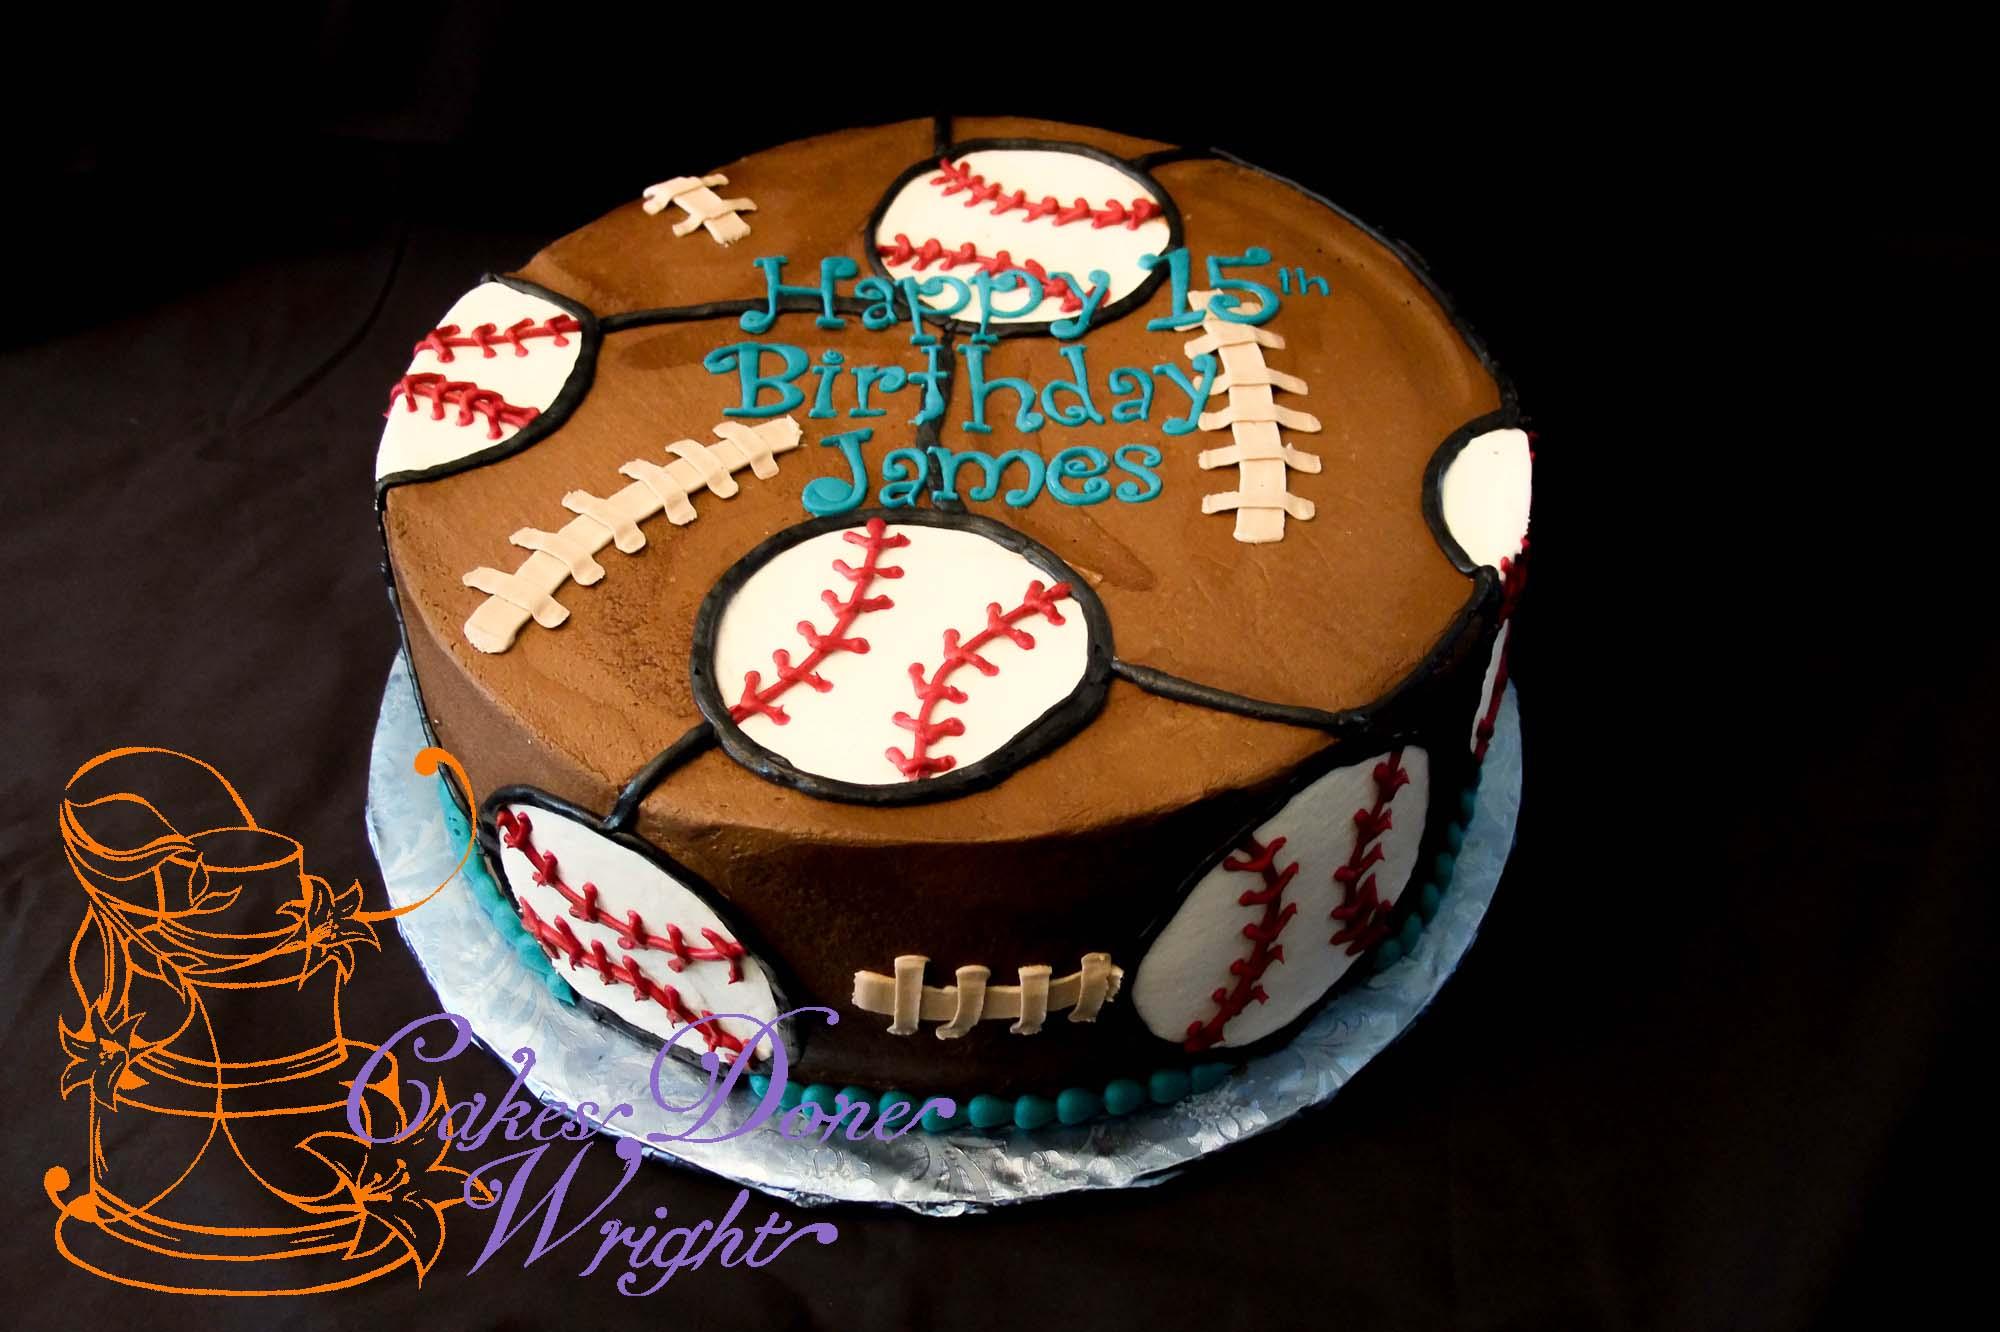 Strange Birthday Cakes Cakesdonewright Funny Birthday Cards Online Fluifree Goldxyz